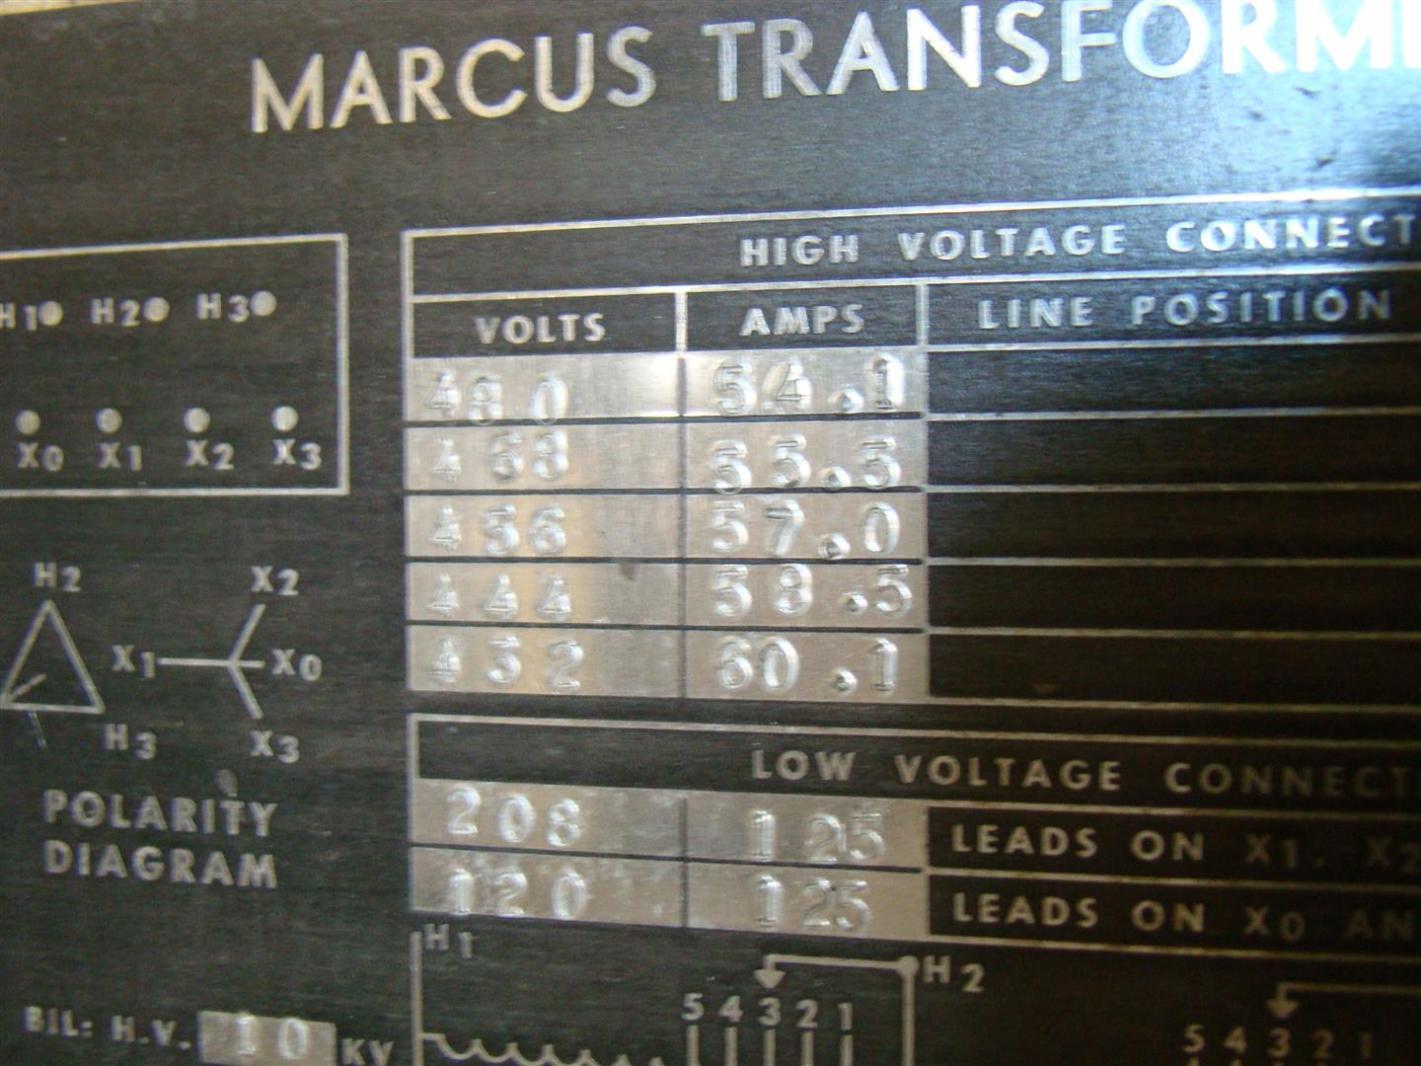 Marcus Transformer 45kva 480x208 120v 3 38979 Ebay 45 Kva Wiring Diagram